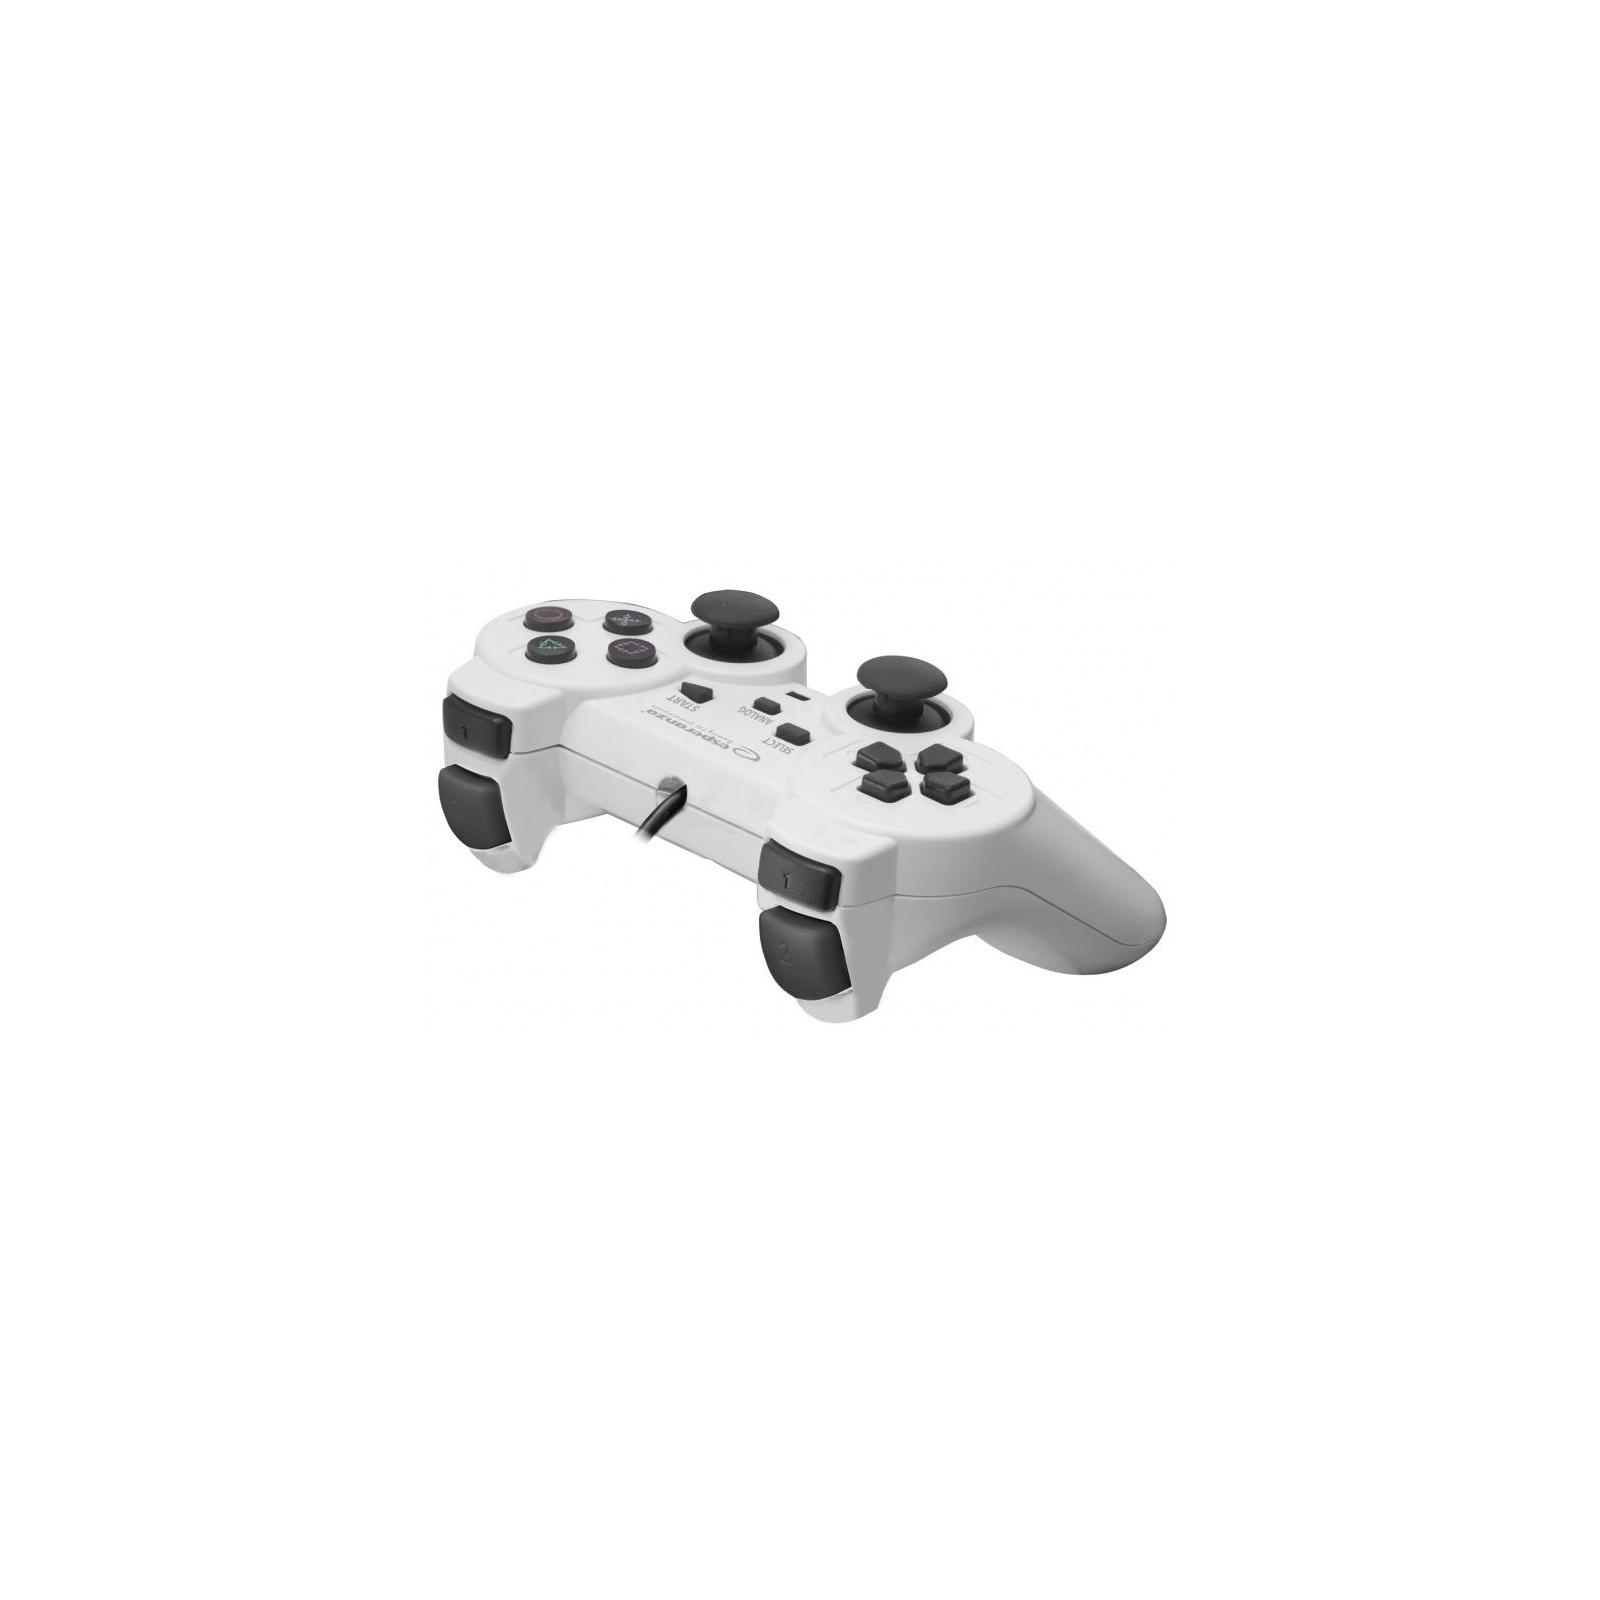 Геймпад Esperanza Trooper PS3/PC White (EGG107W) изображение 2